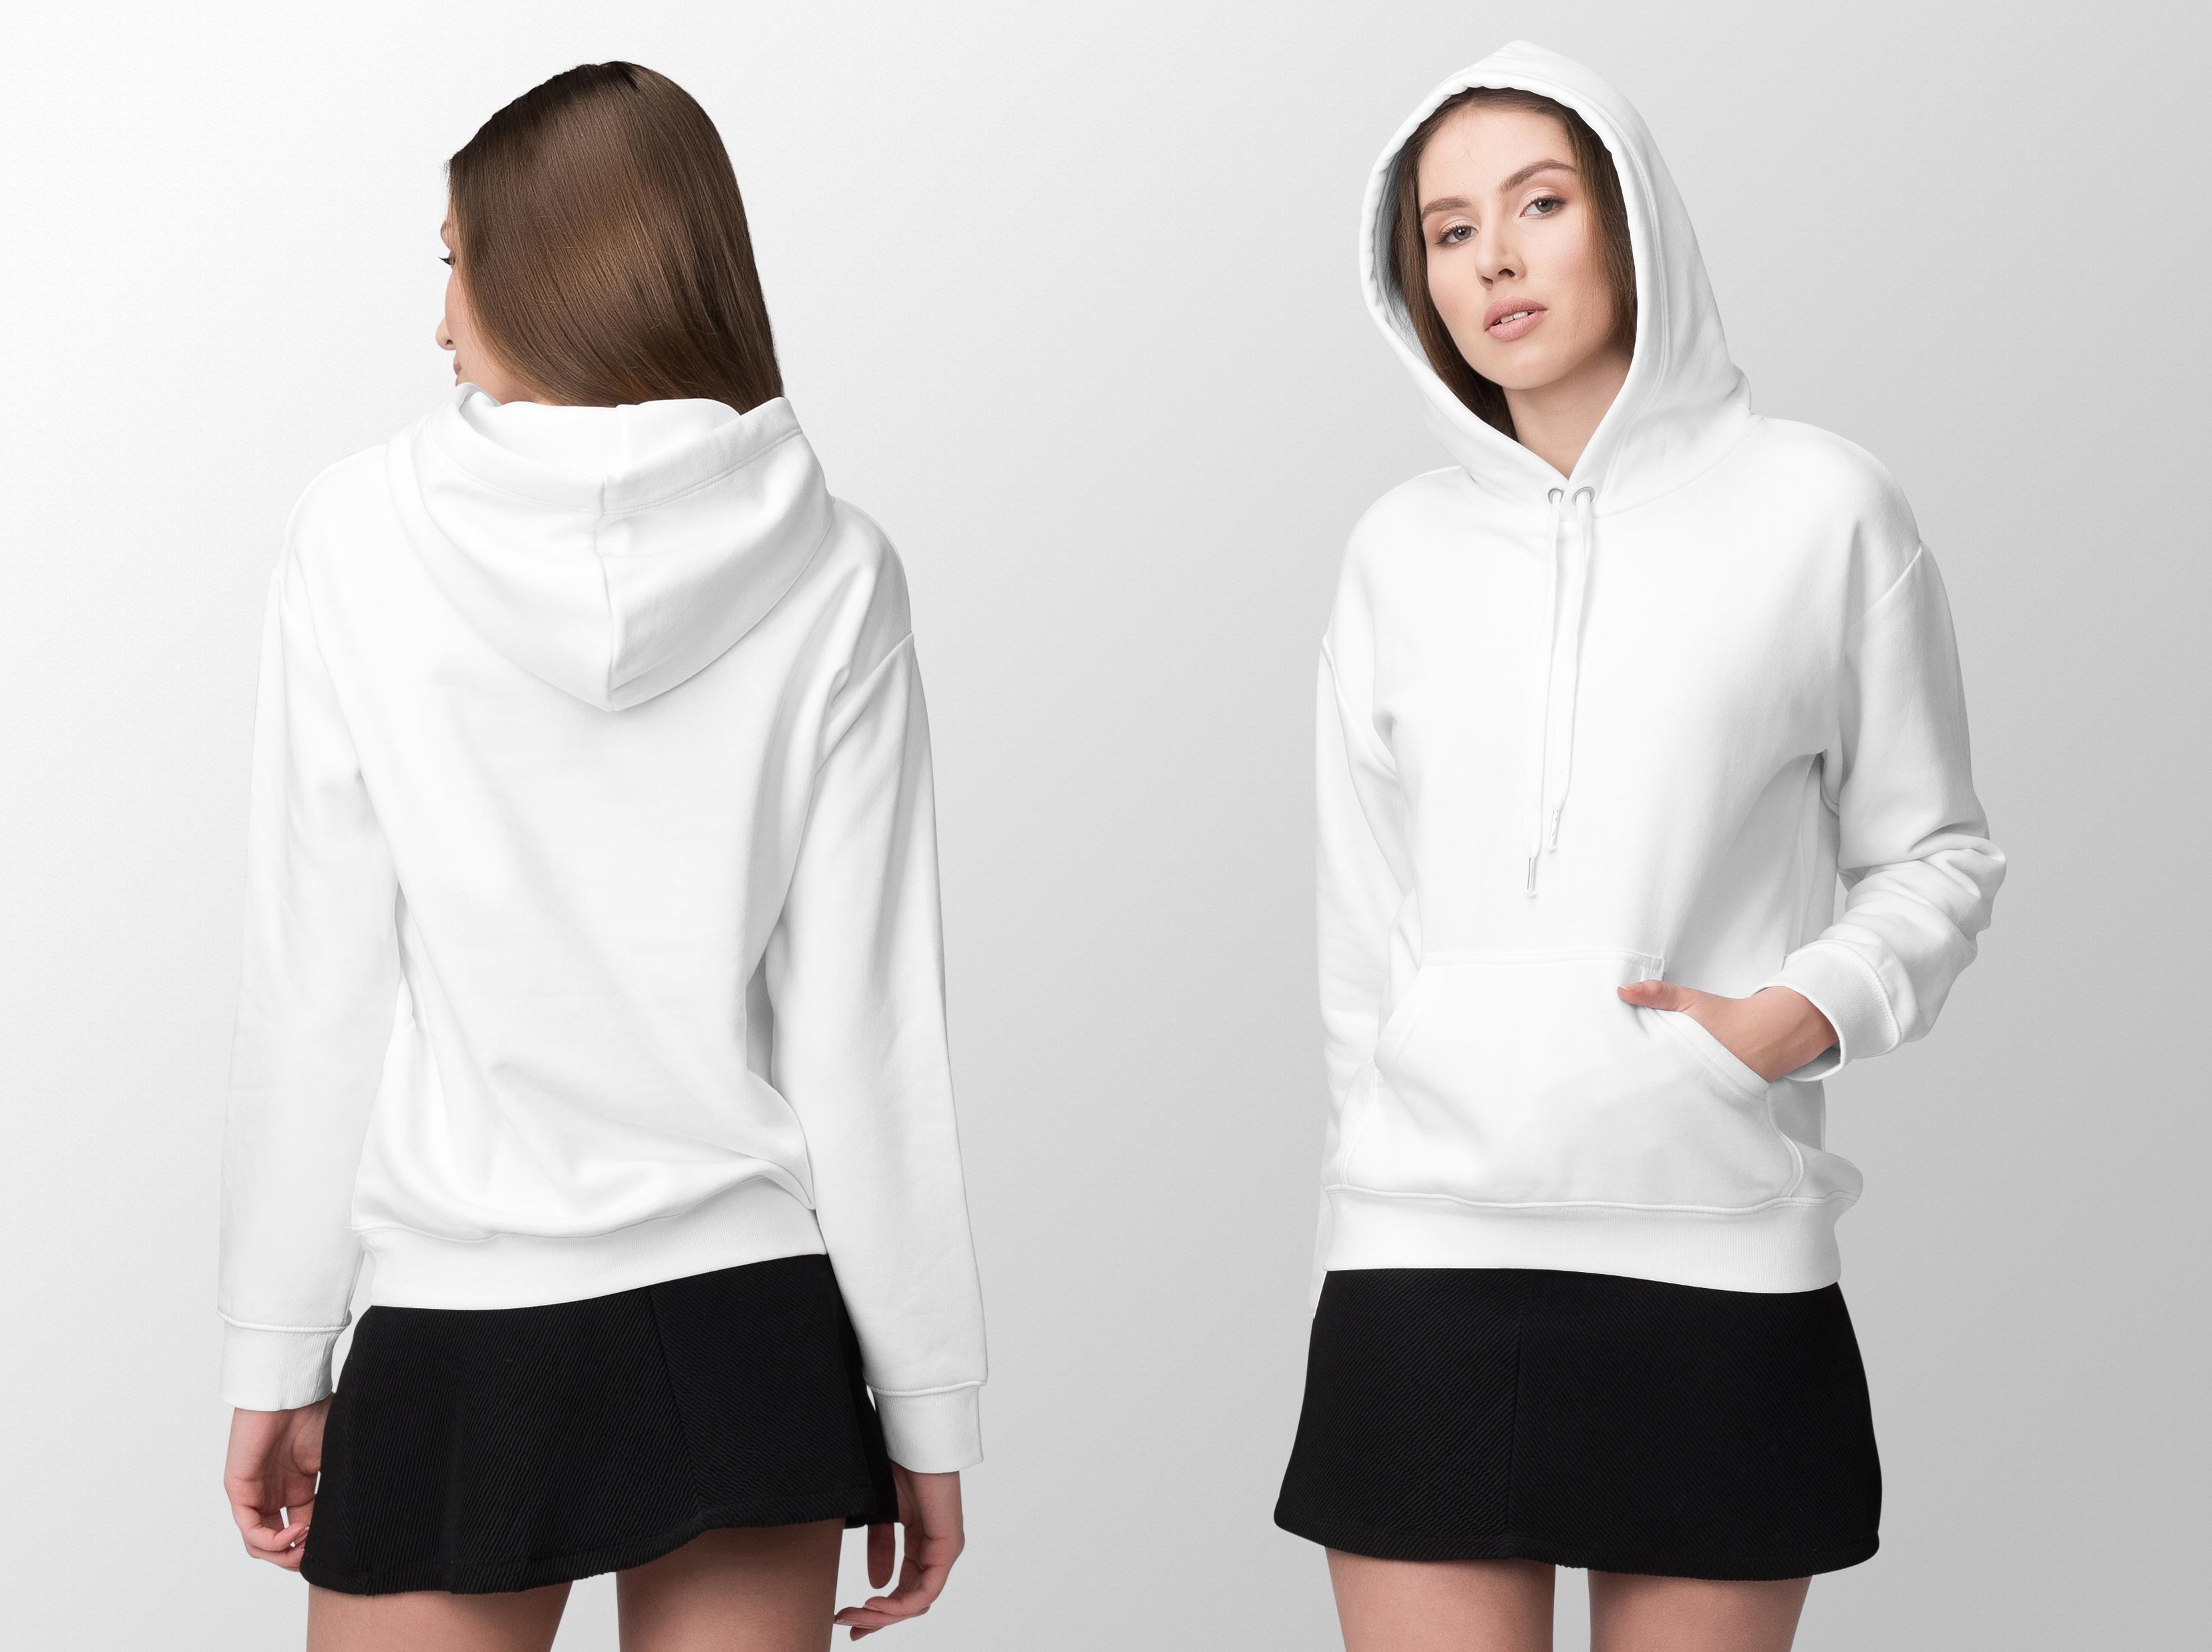 Custom made sweatshirts